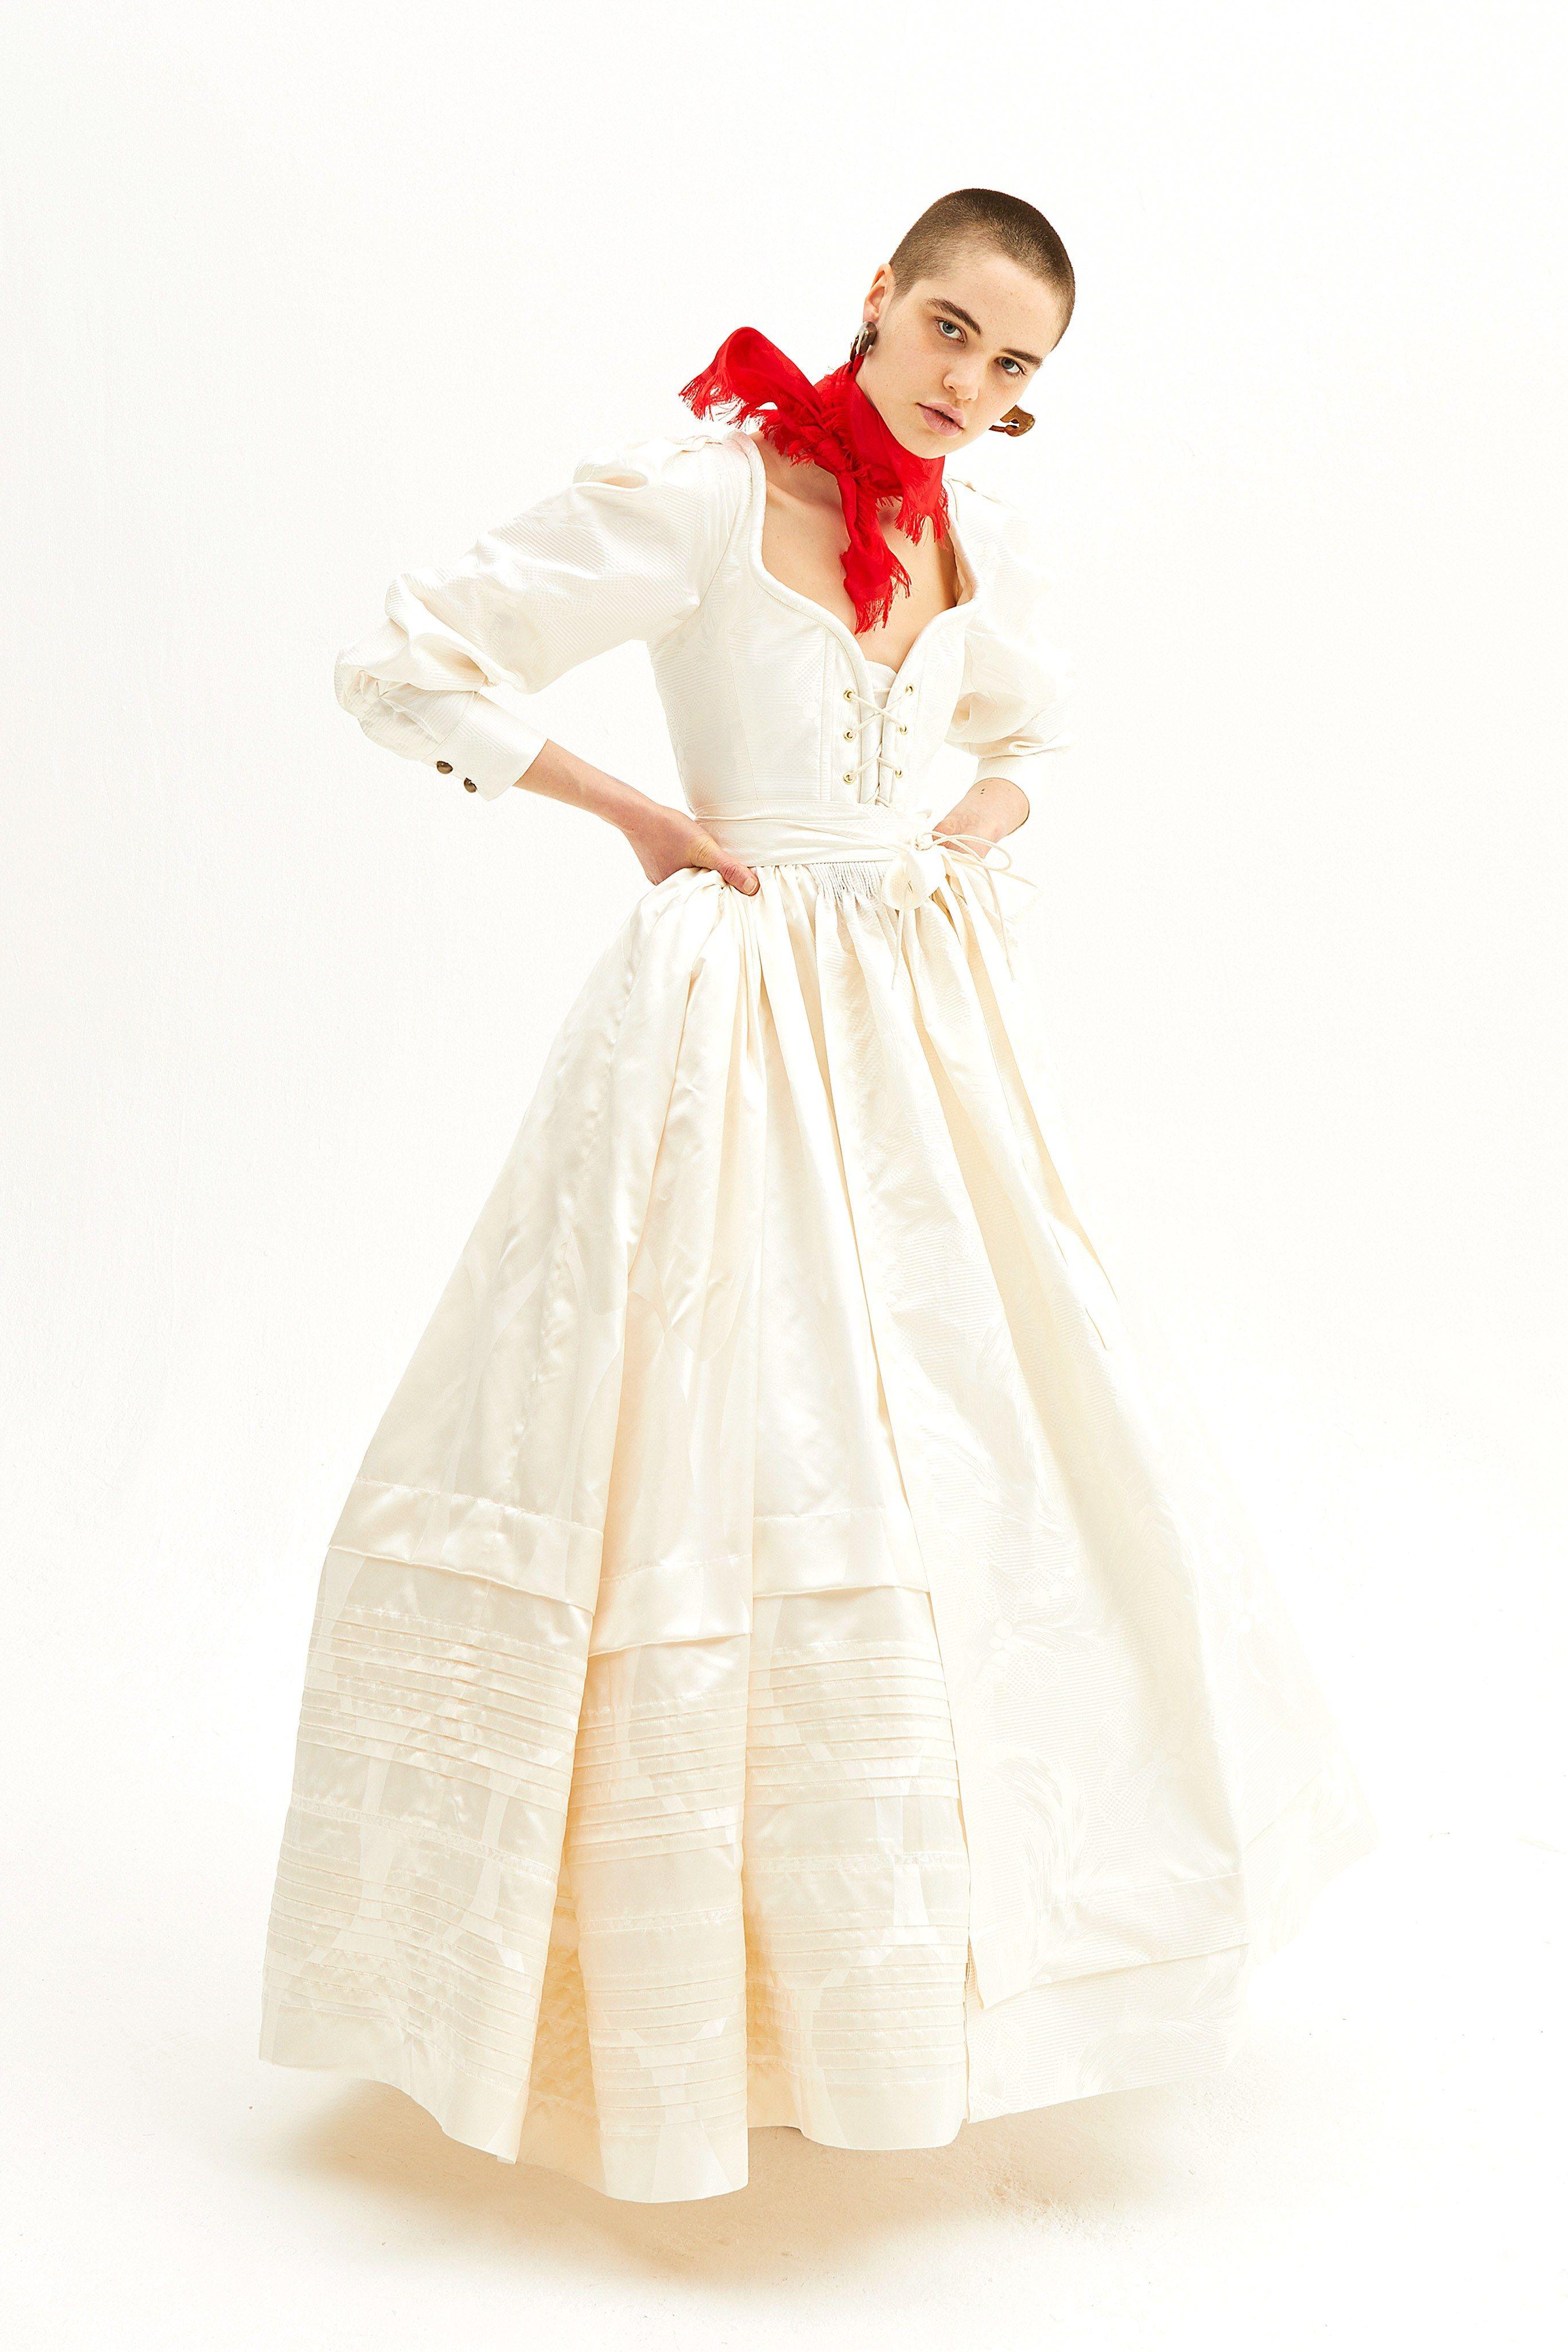 Vivienne westwood wedding dress  Andreas Kronthaler for Vivienne Westwood Fall   Brides